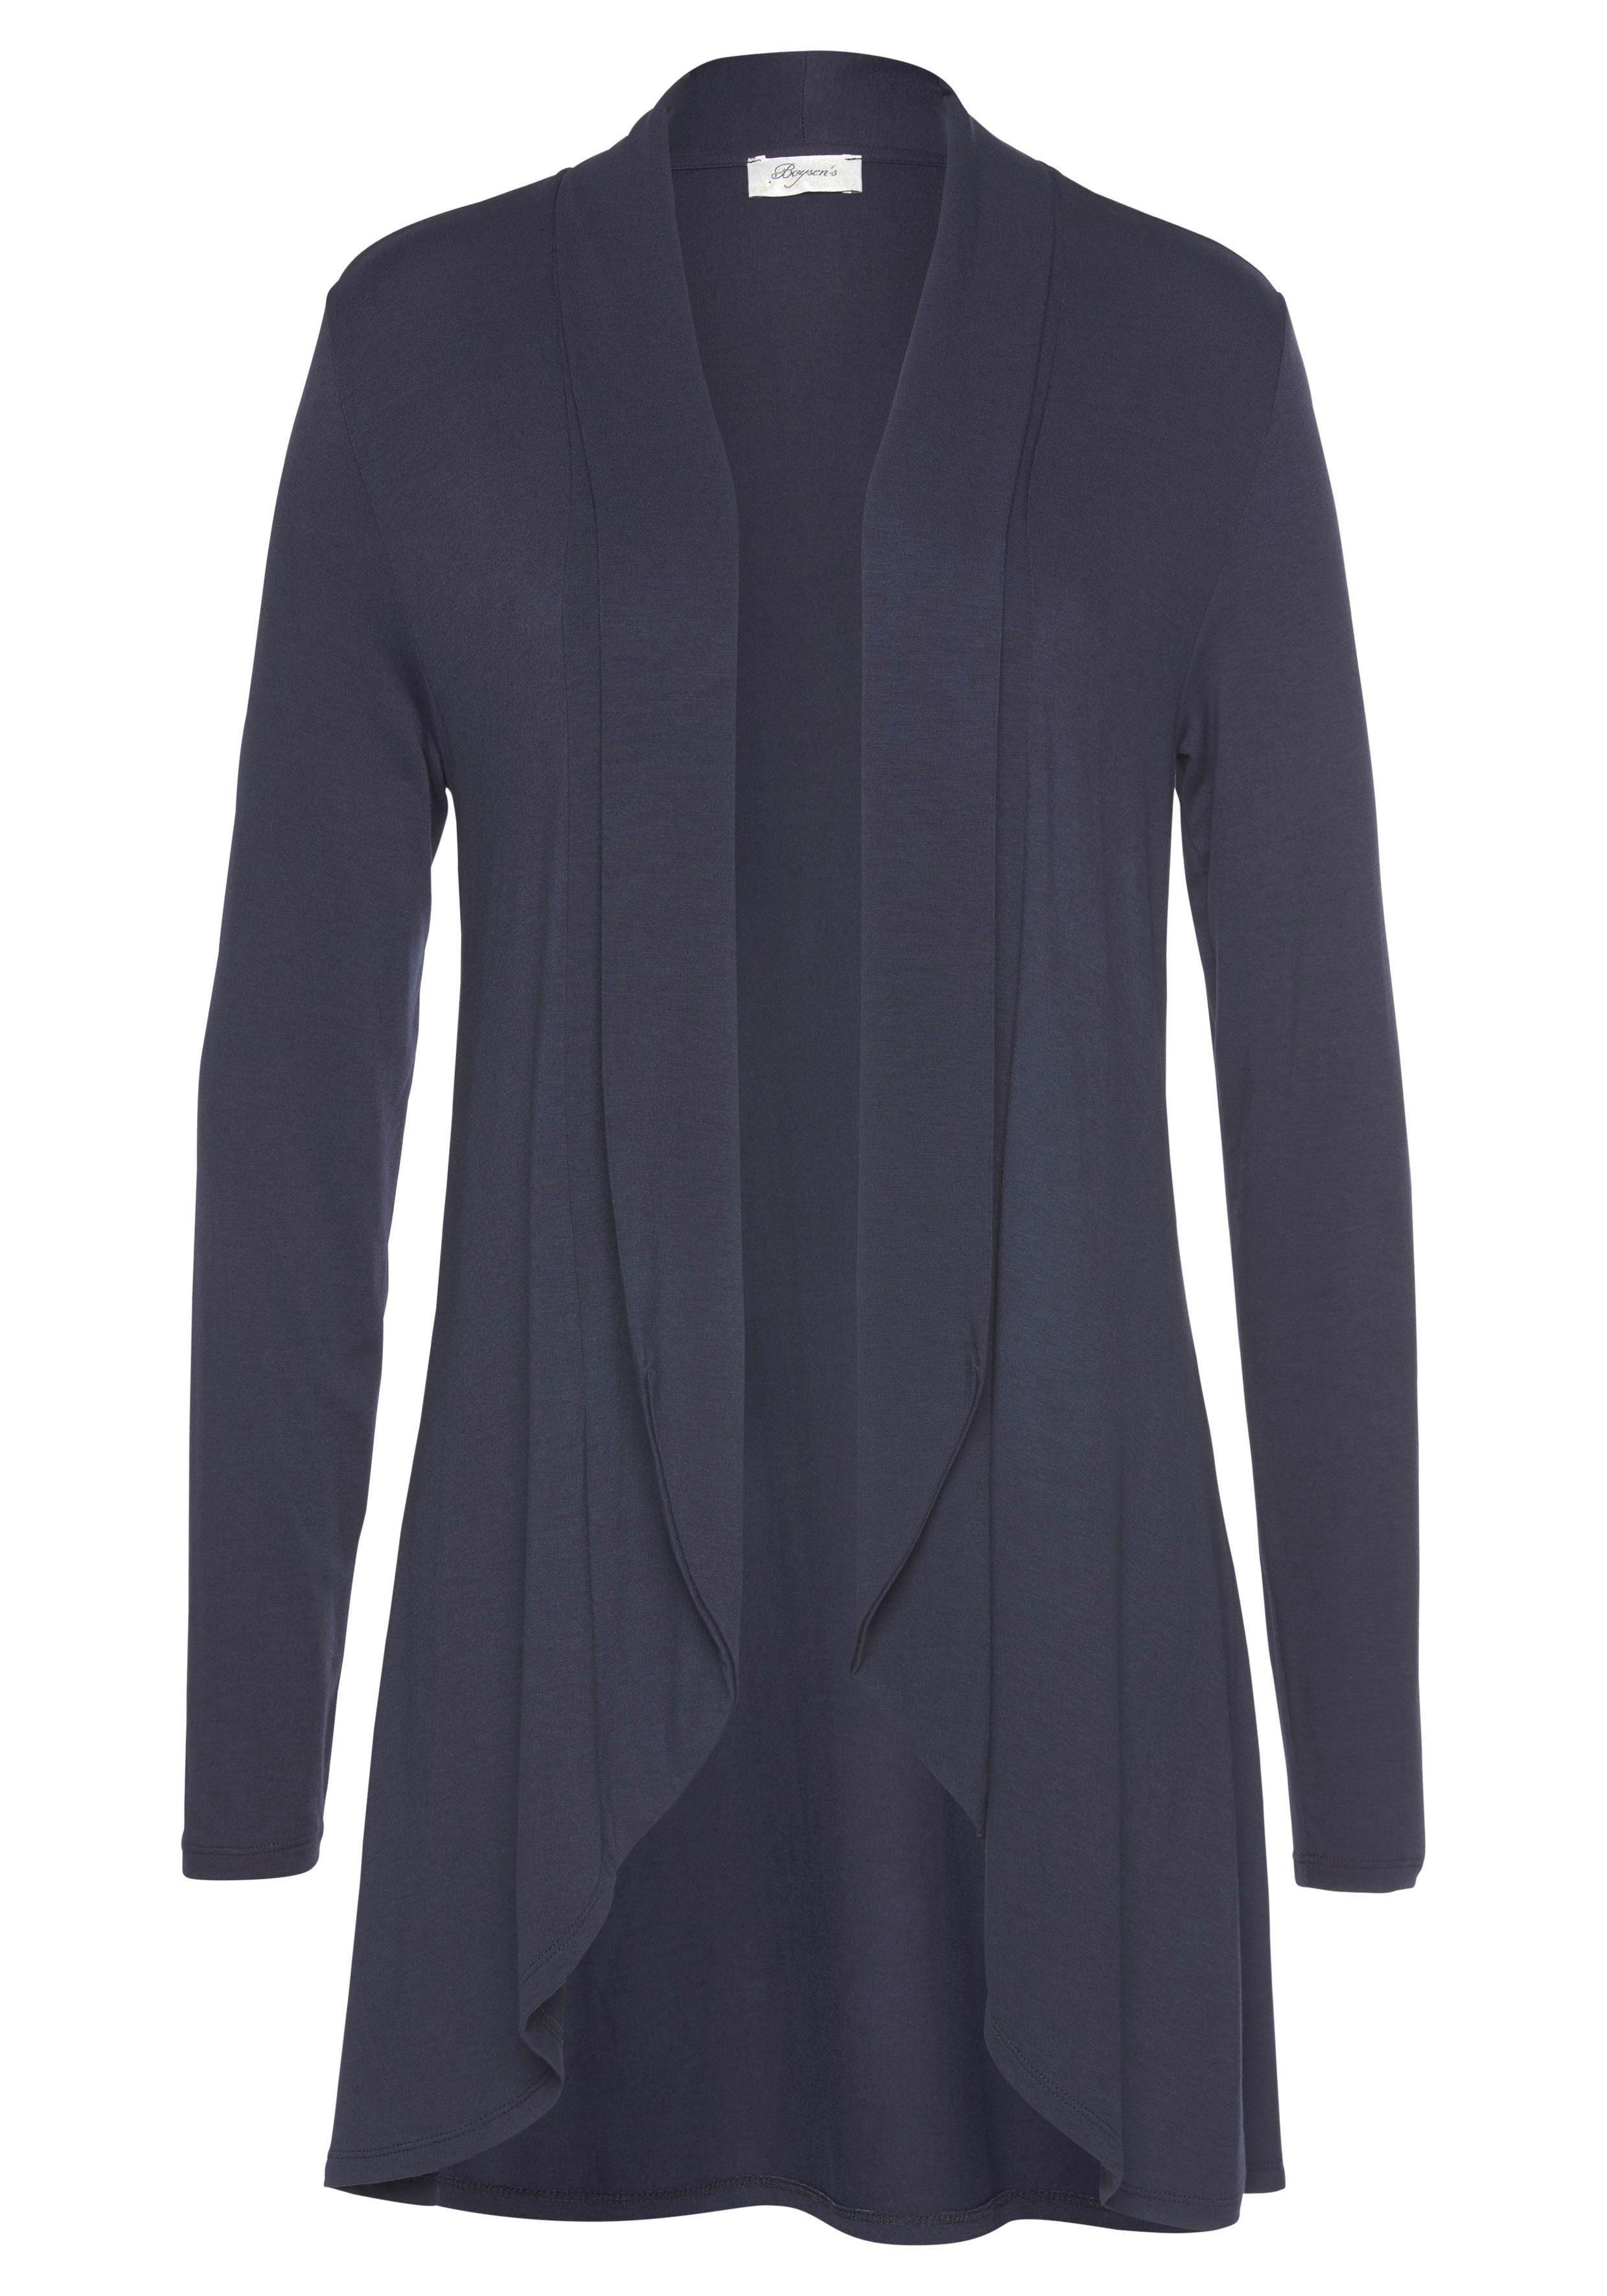 Boysen's Shirtjacke | Bekleidung > Shirts > Shirtjacken | Boysen's